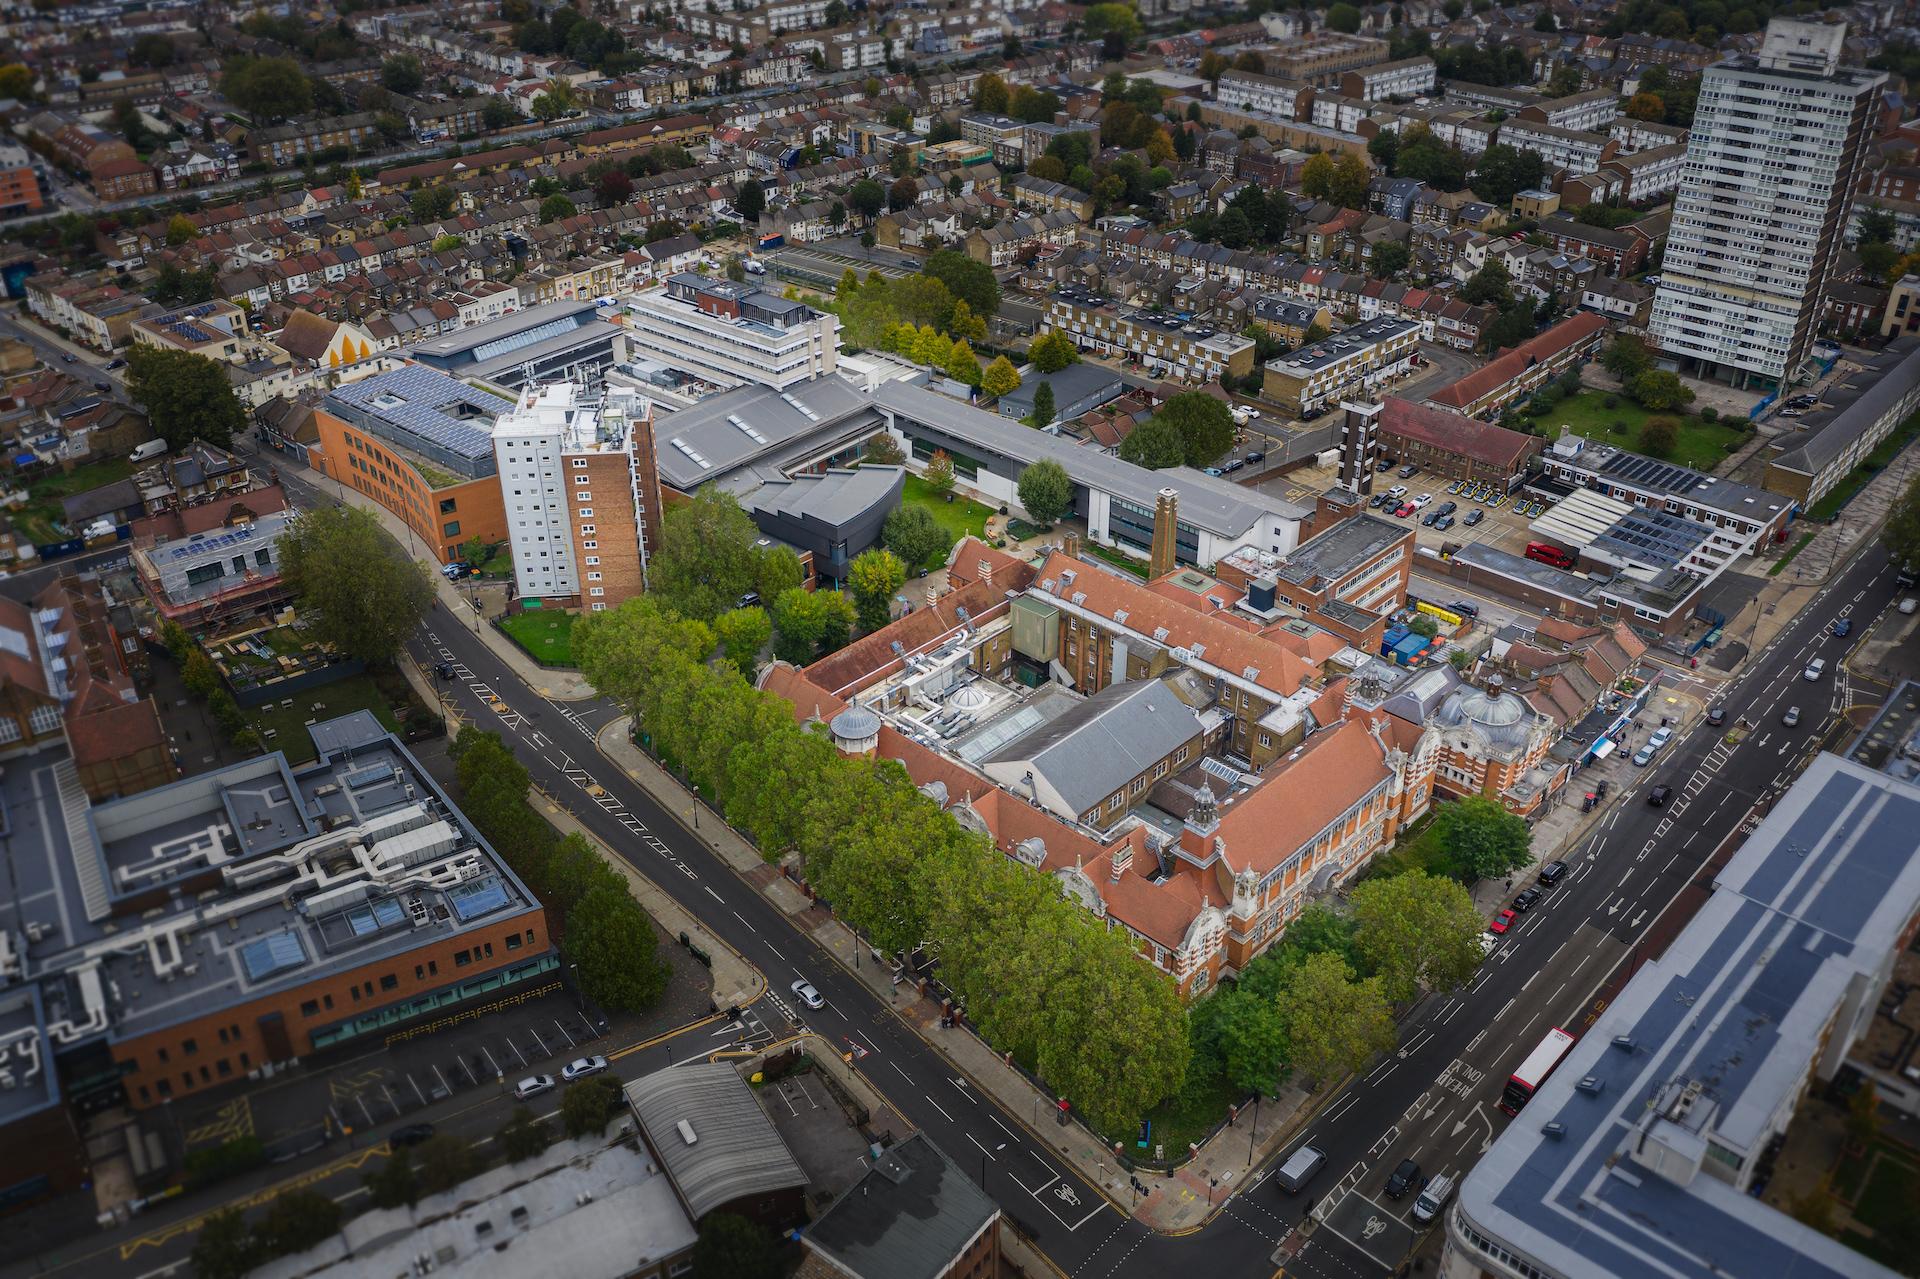 Aerial photo of Stratford